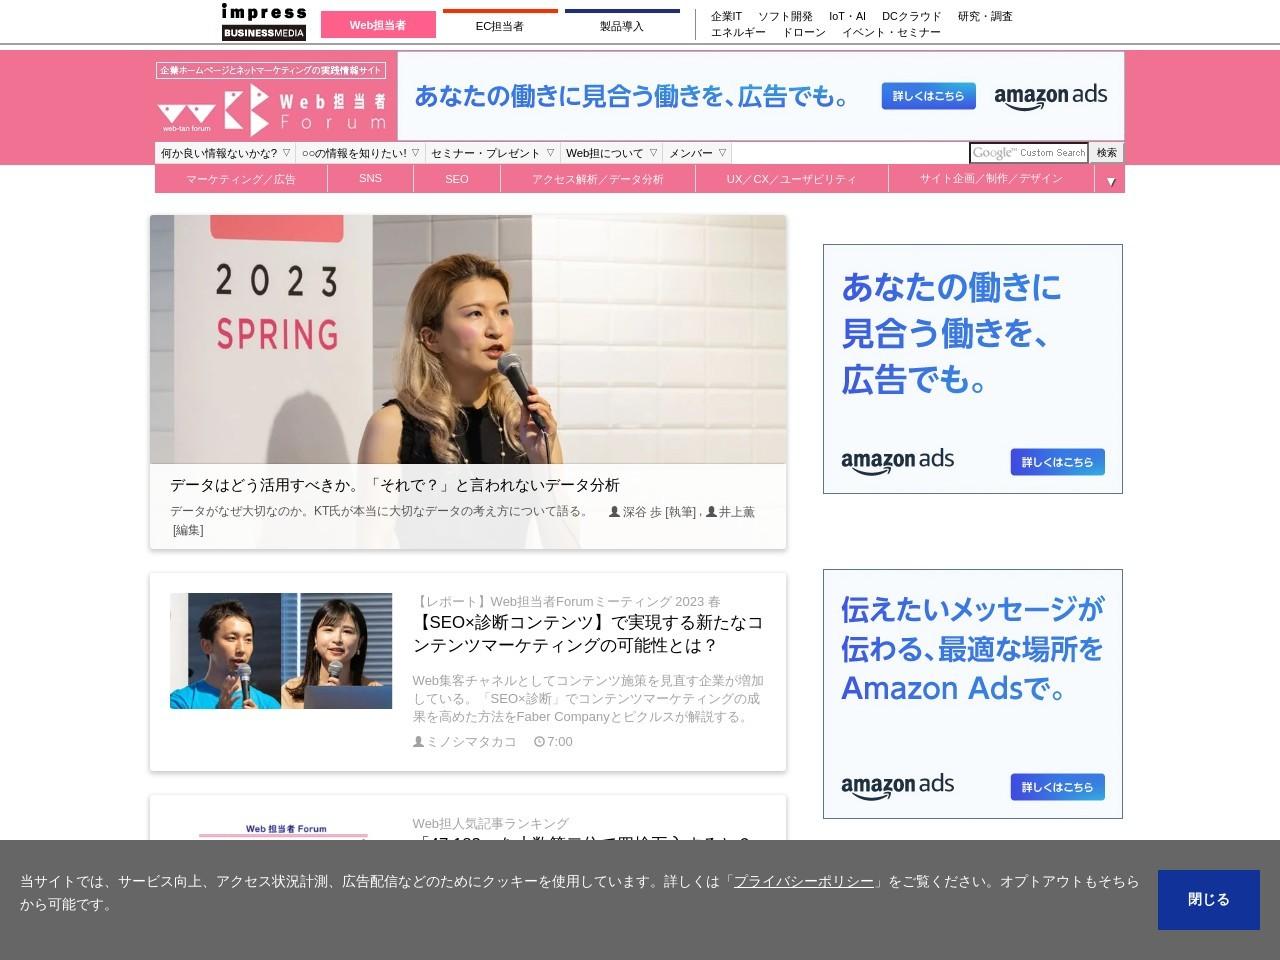 http://web-tan.forum.impressrd.jp/e/2010/11/15/9185